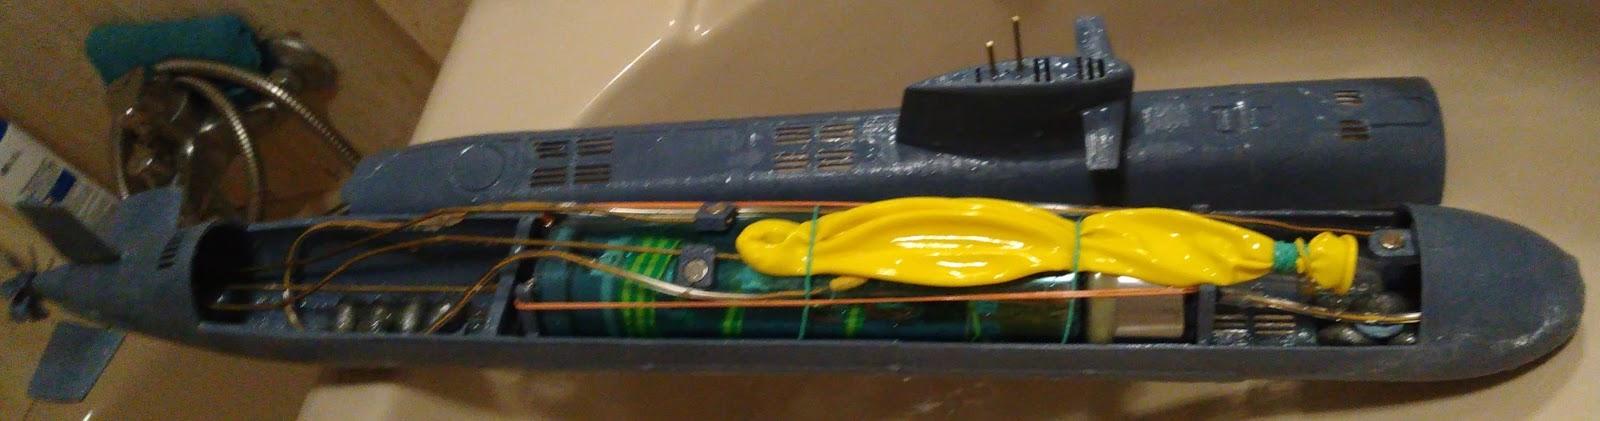 1:120 Spanish S-80 submarine IMG_20190629_185805_409r